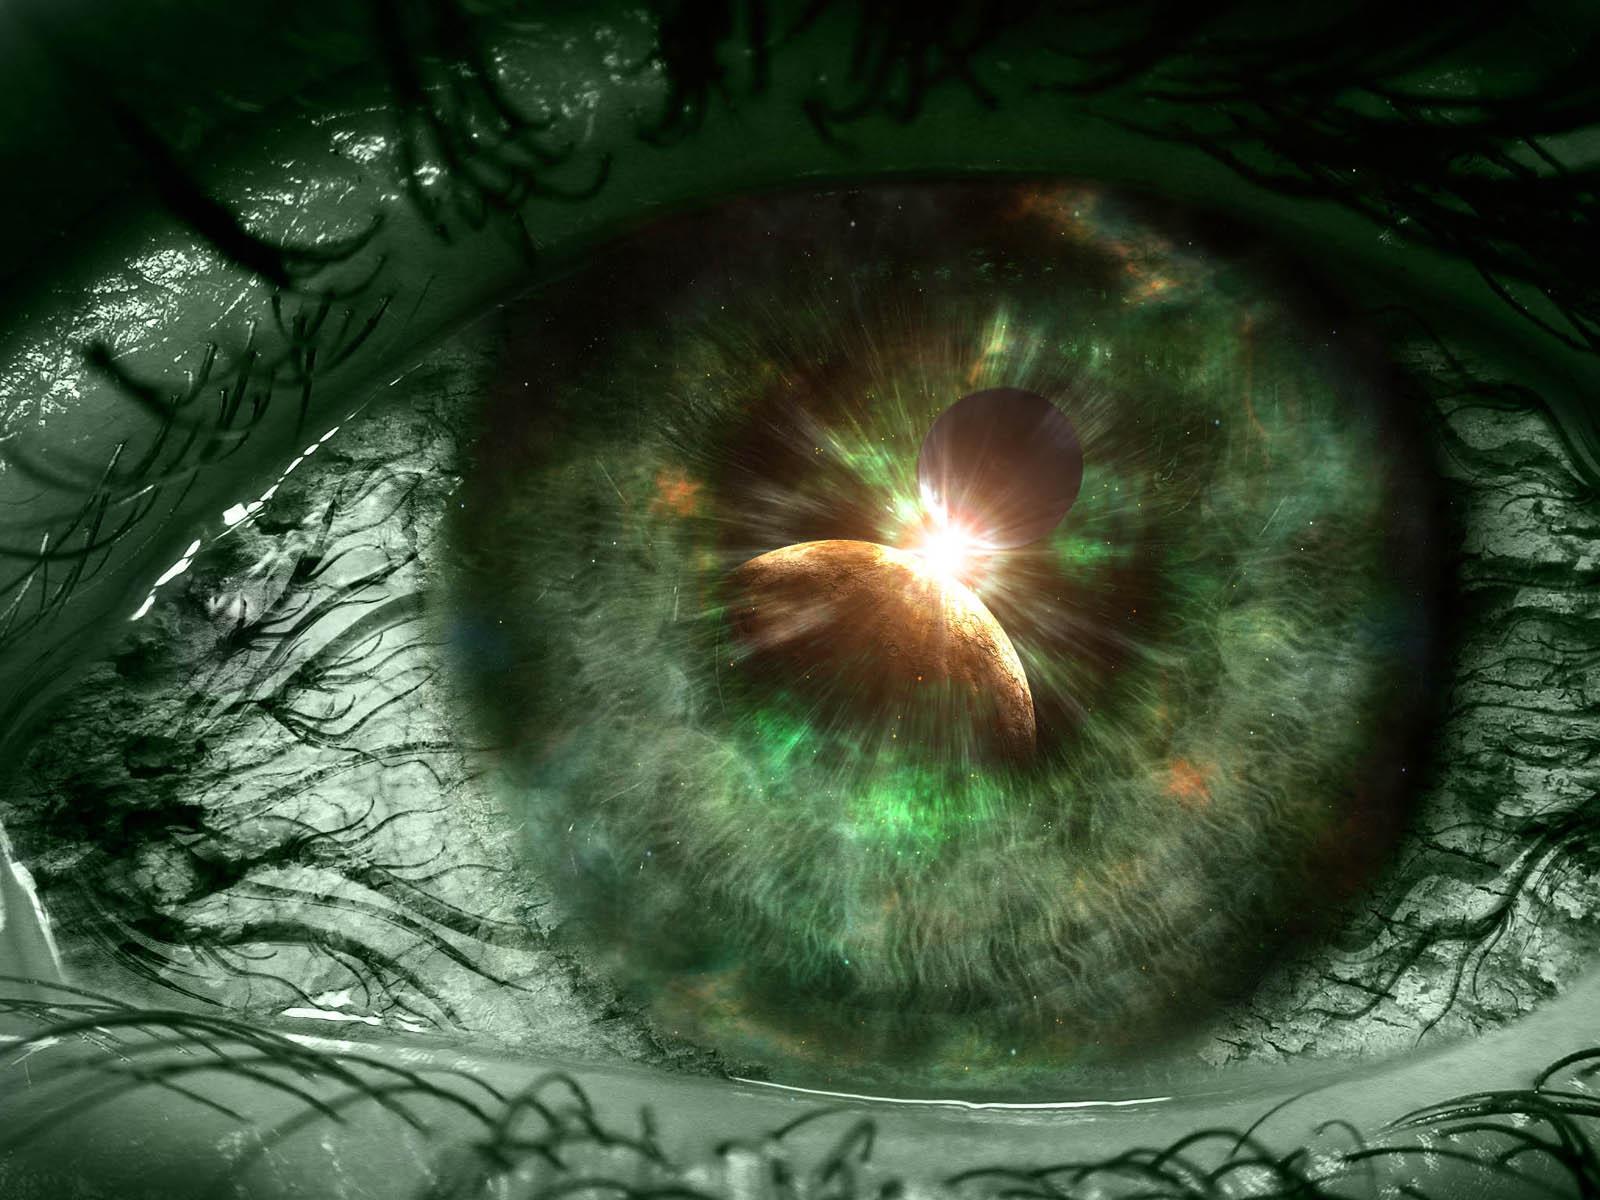 http://3.bp.blogspot.com/-EB4ym-x0LfY/Tkp70YFh8KI/AAAAAAAAAVo/o9NCVky3qo0/s1600/Cosmic_Vision.jpg